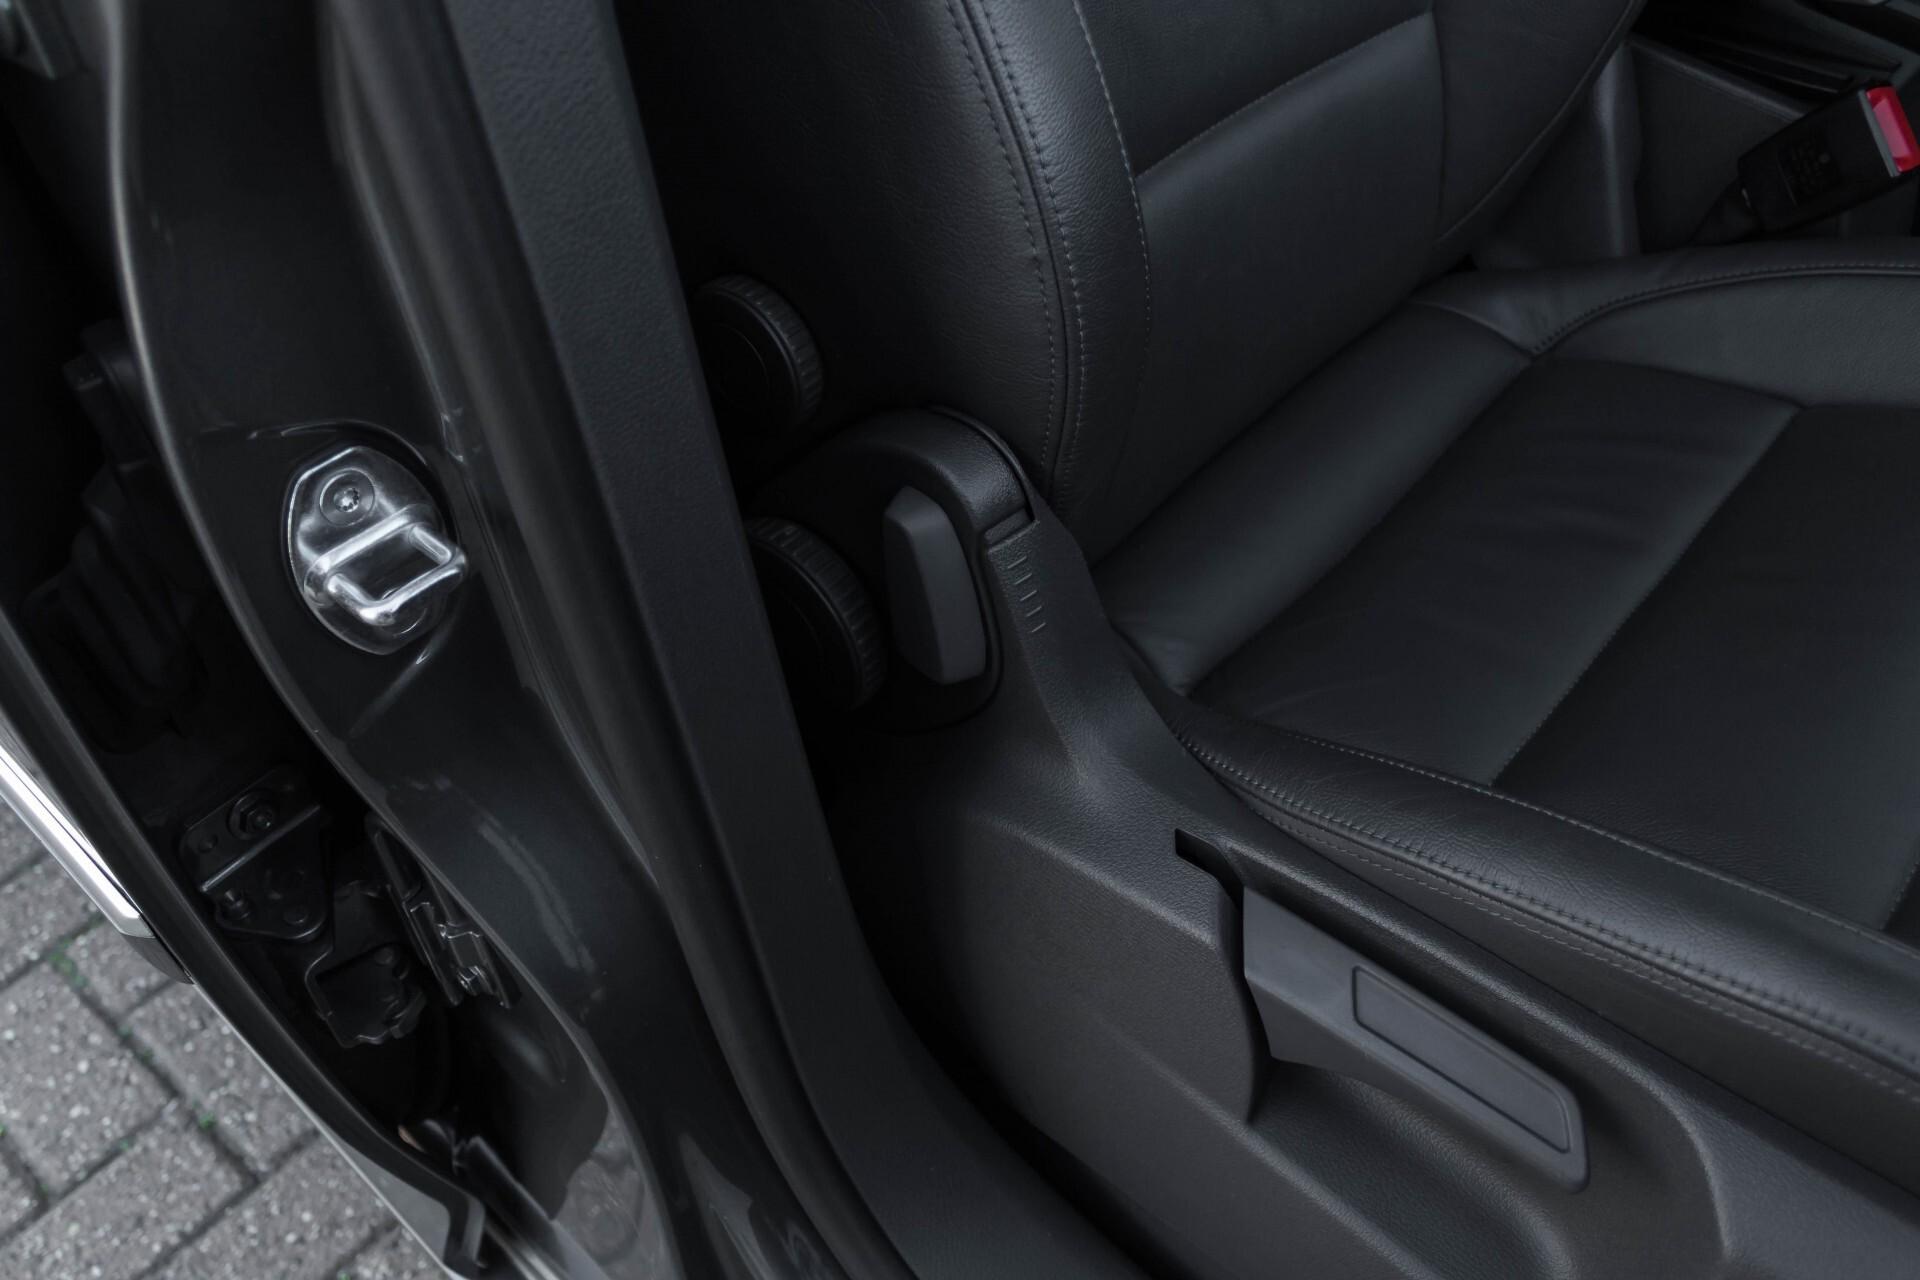 Volkswagen Touran 2.0 TDI Highline 7Persoons 177pk Panorama/Leder/Navi/Camera/Verw-Stln/Trhk/ECC/Xenon Aut Foto 36